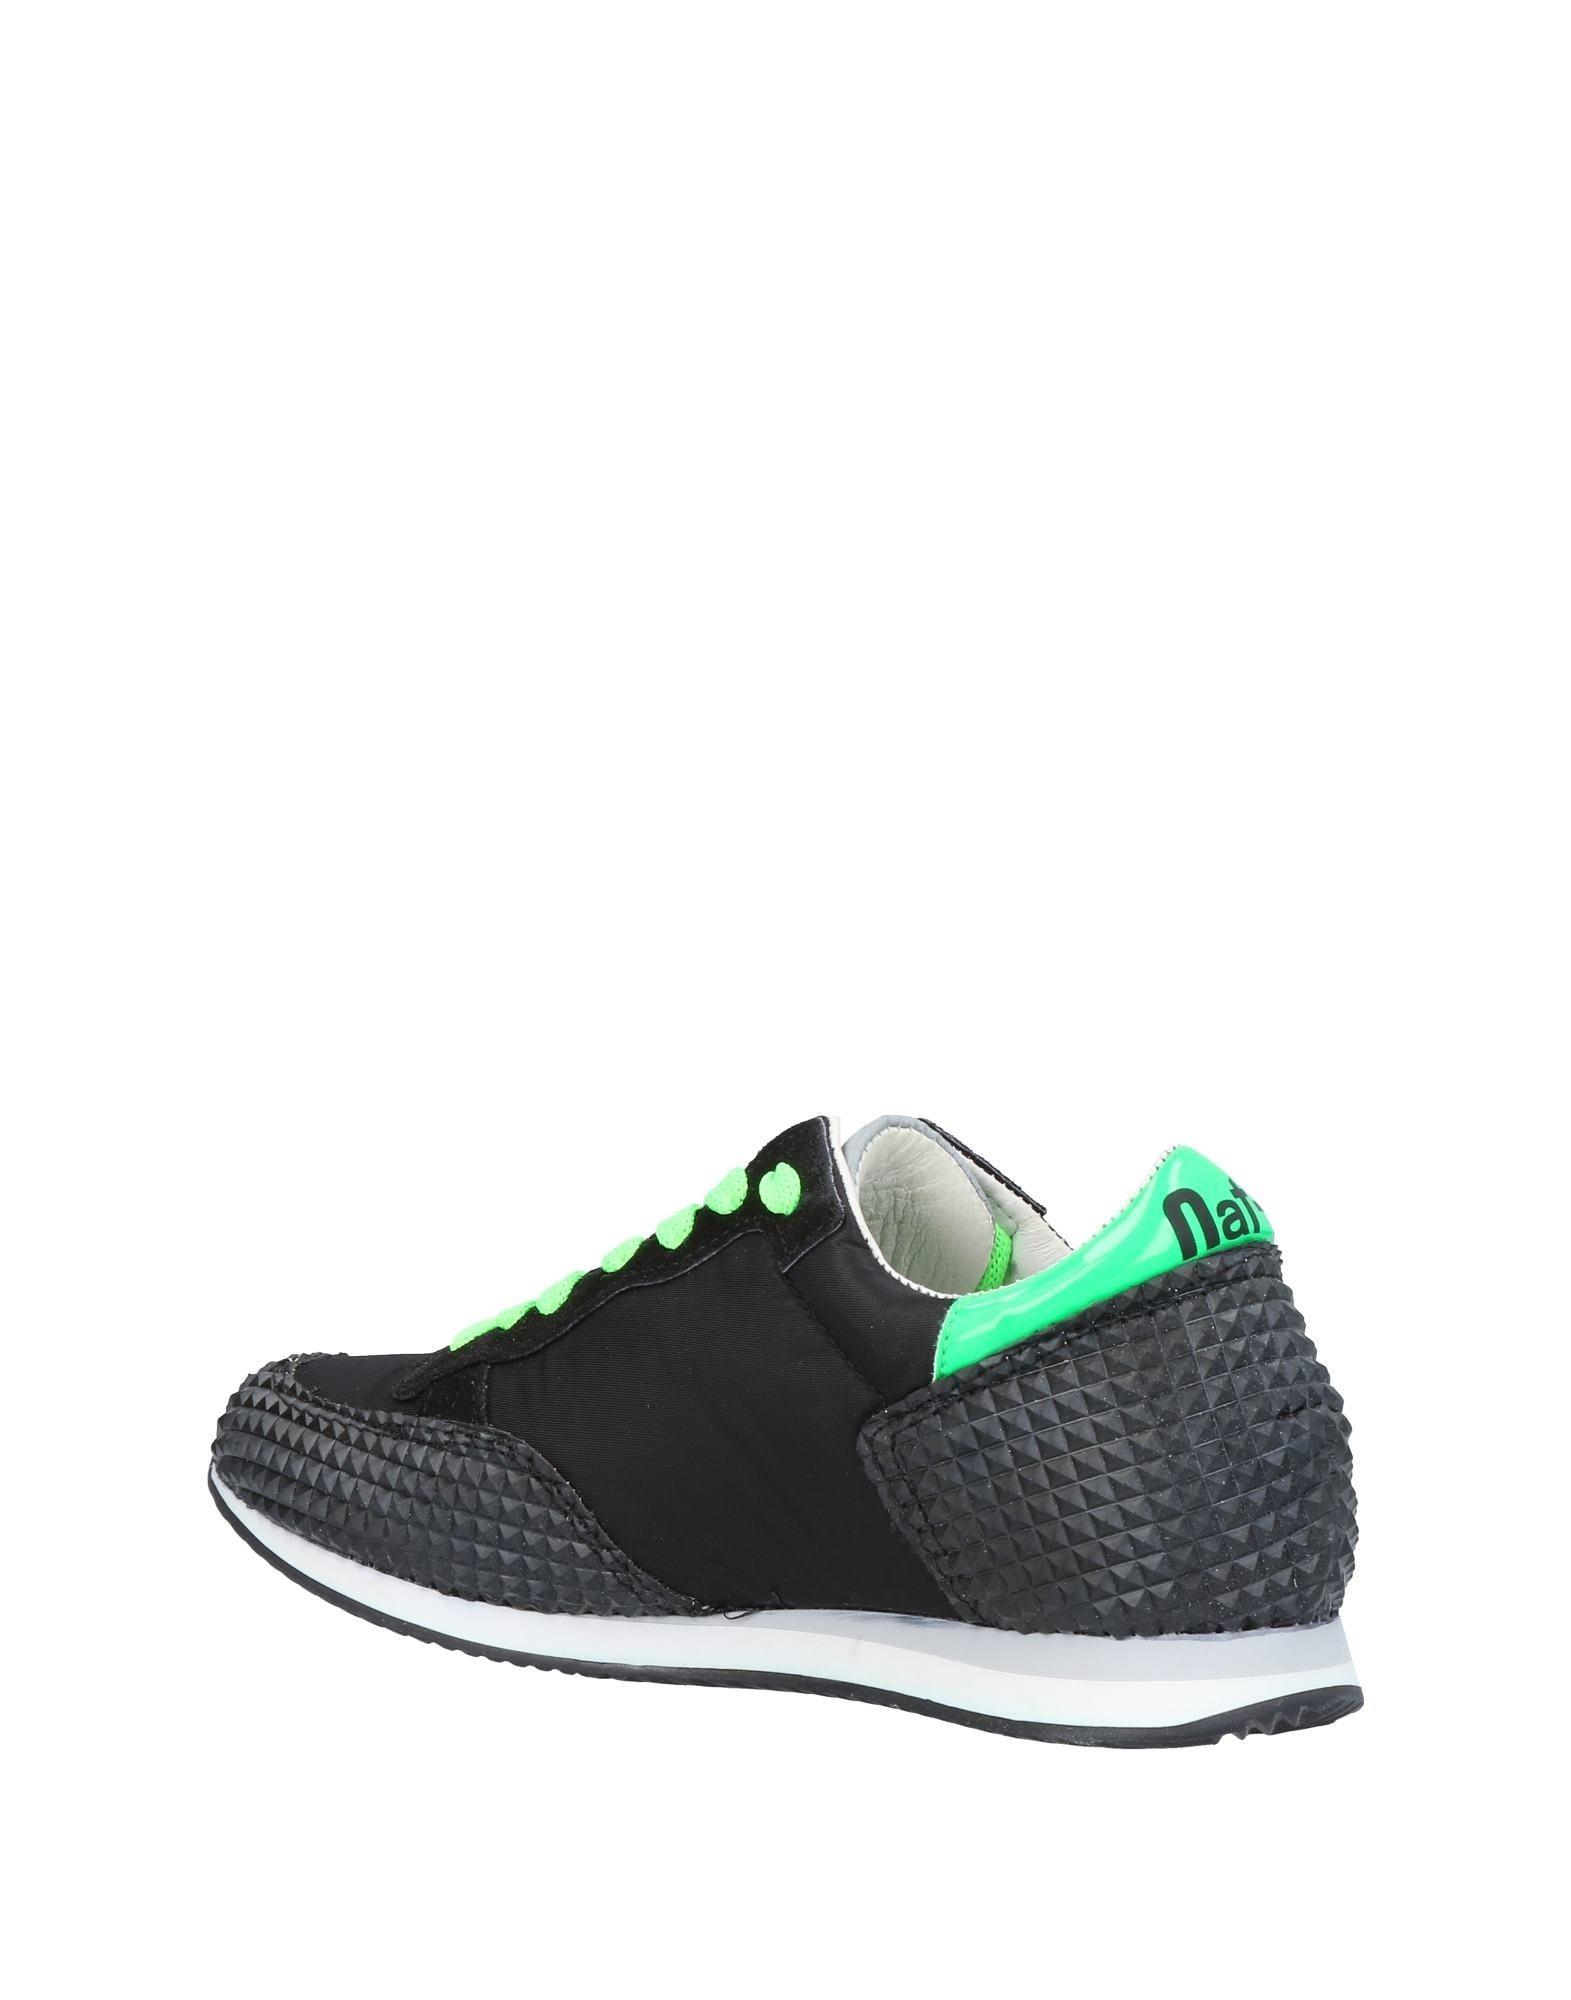 Sneakers Nat-2 Femme - Sneakers Nat-2 sur